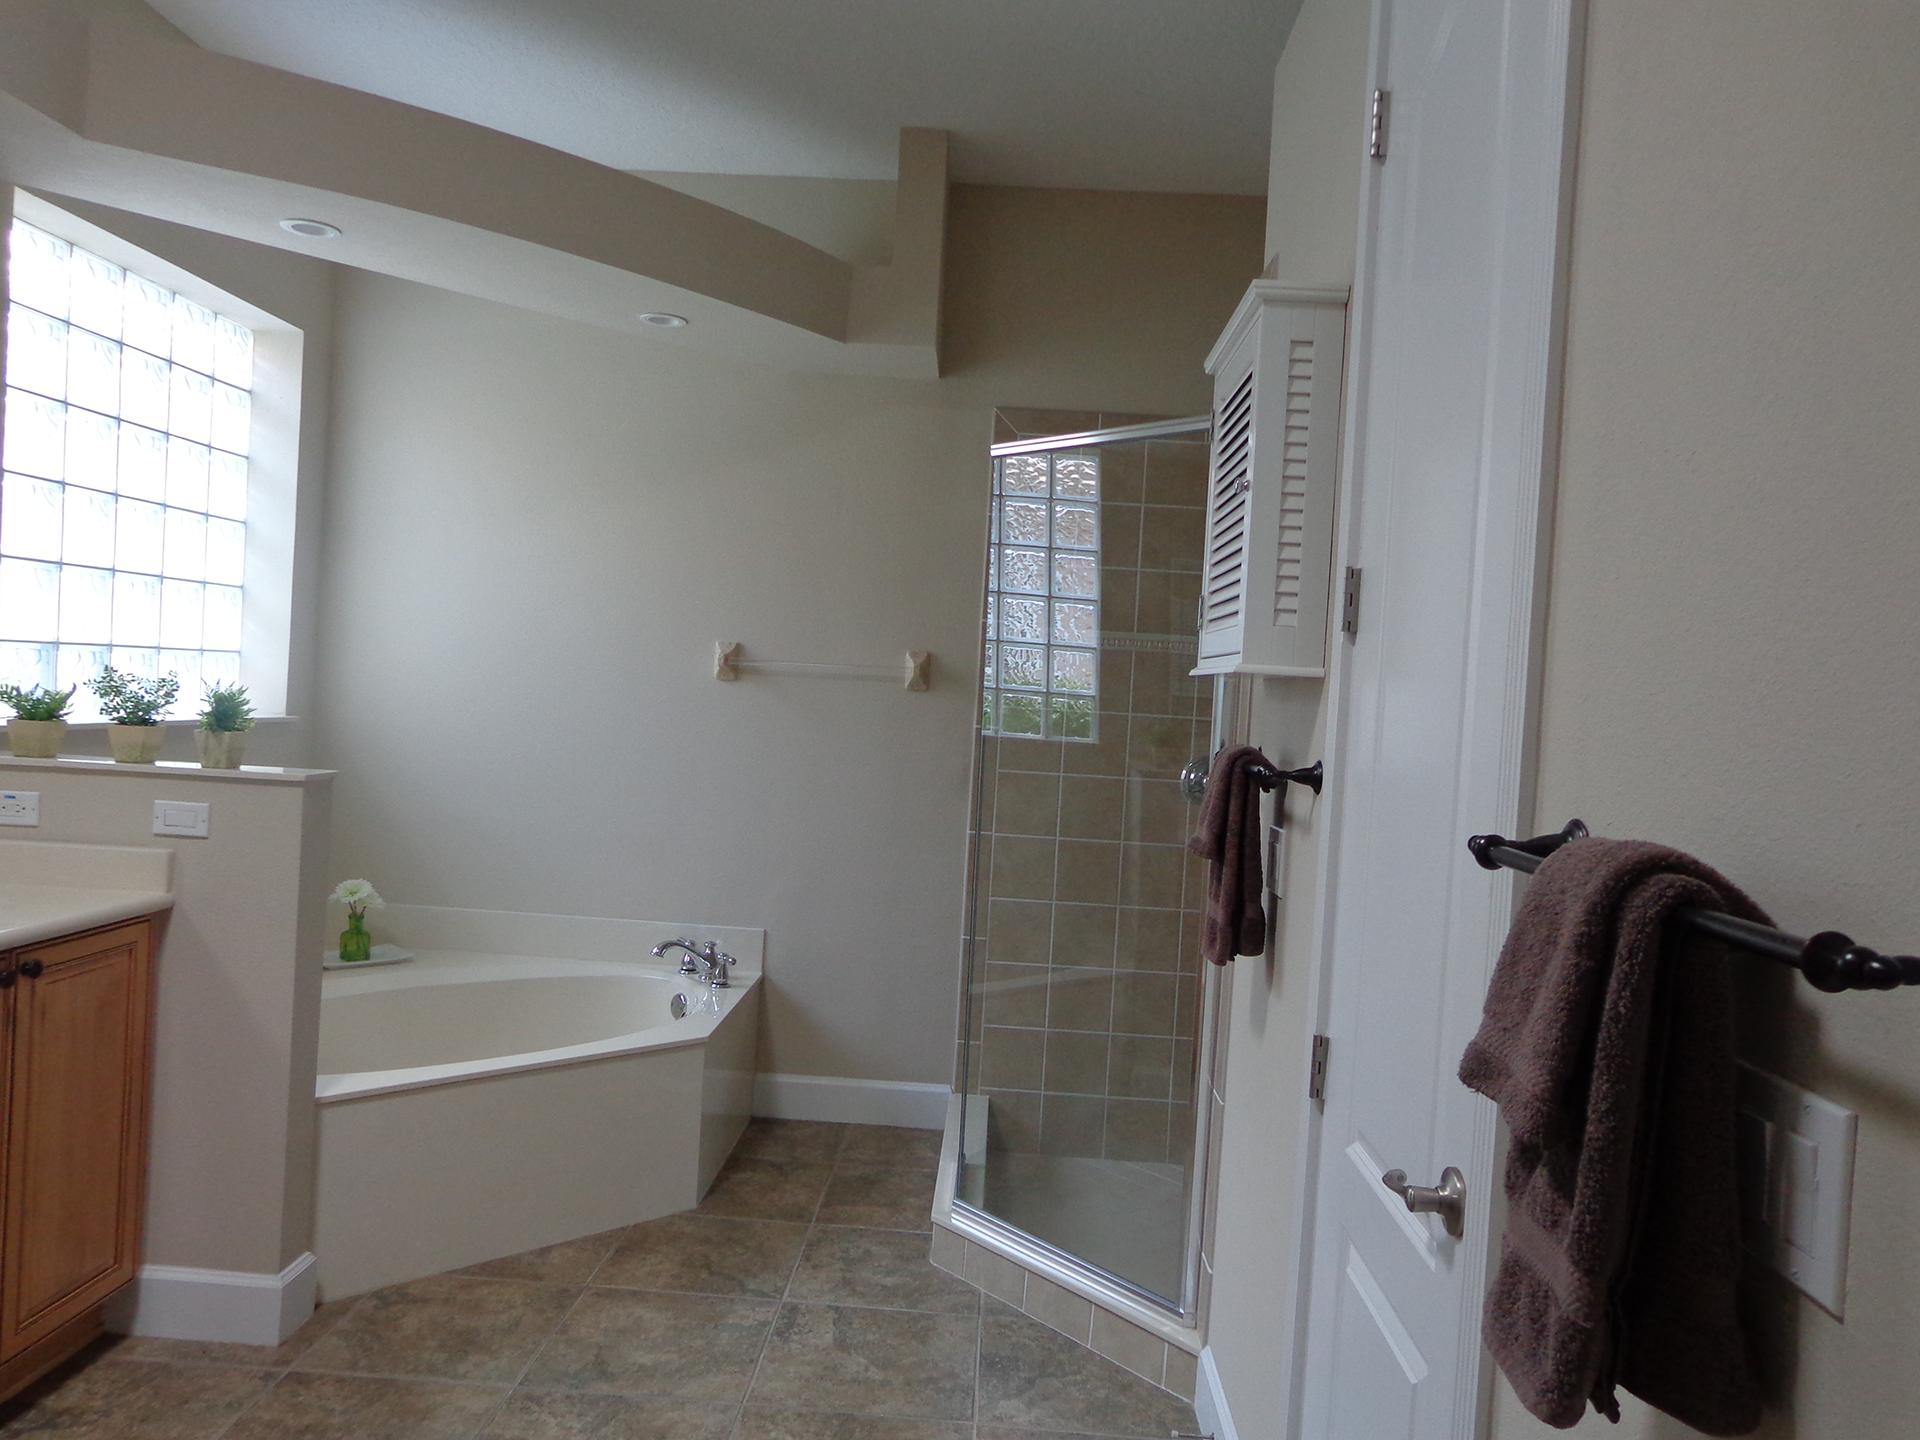 Staged-Assets-Home-Staging-Interior-Design-Palm-Coast-Florida-12